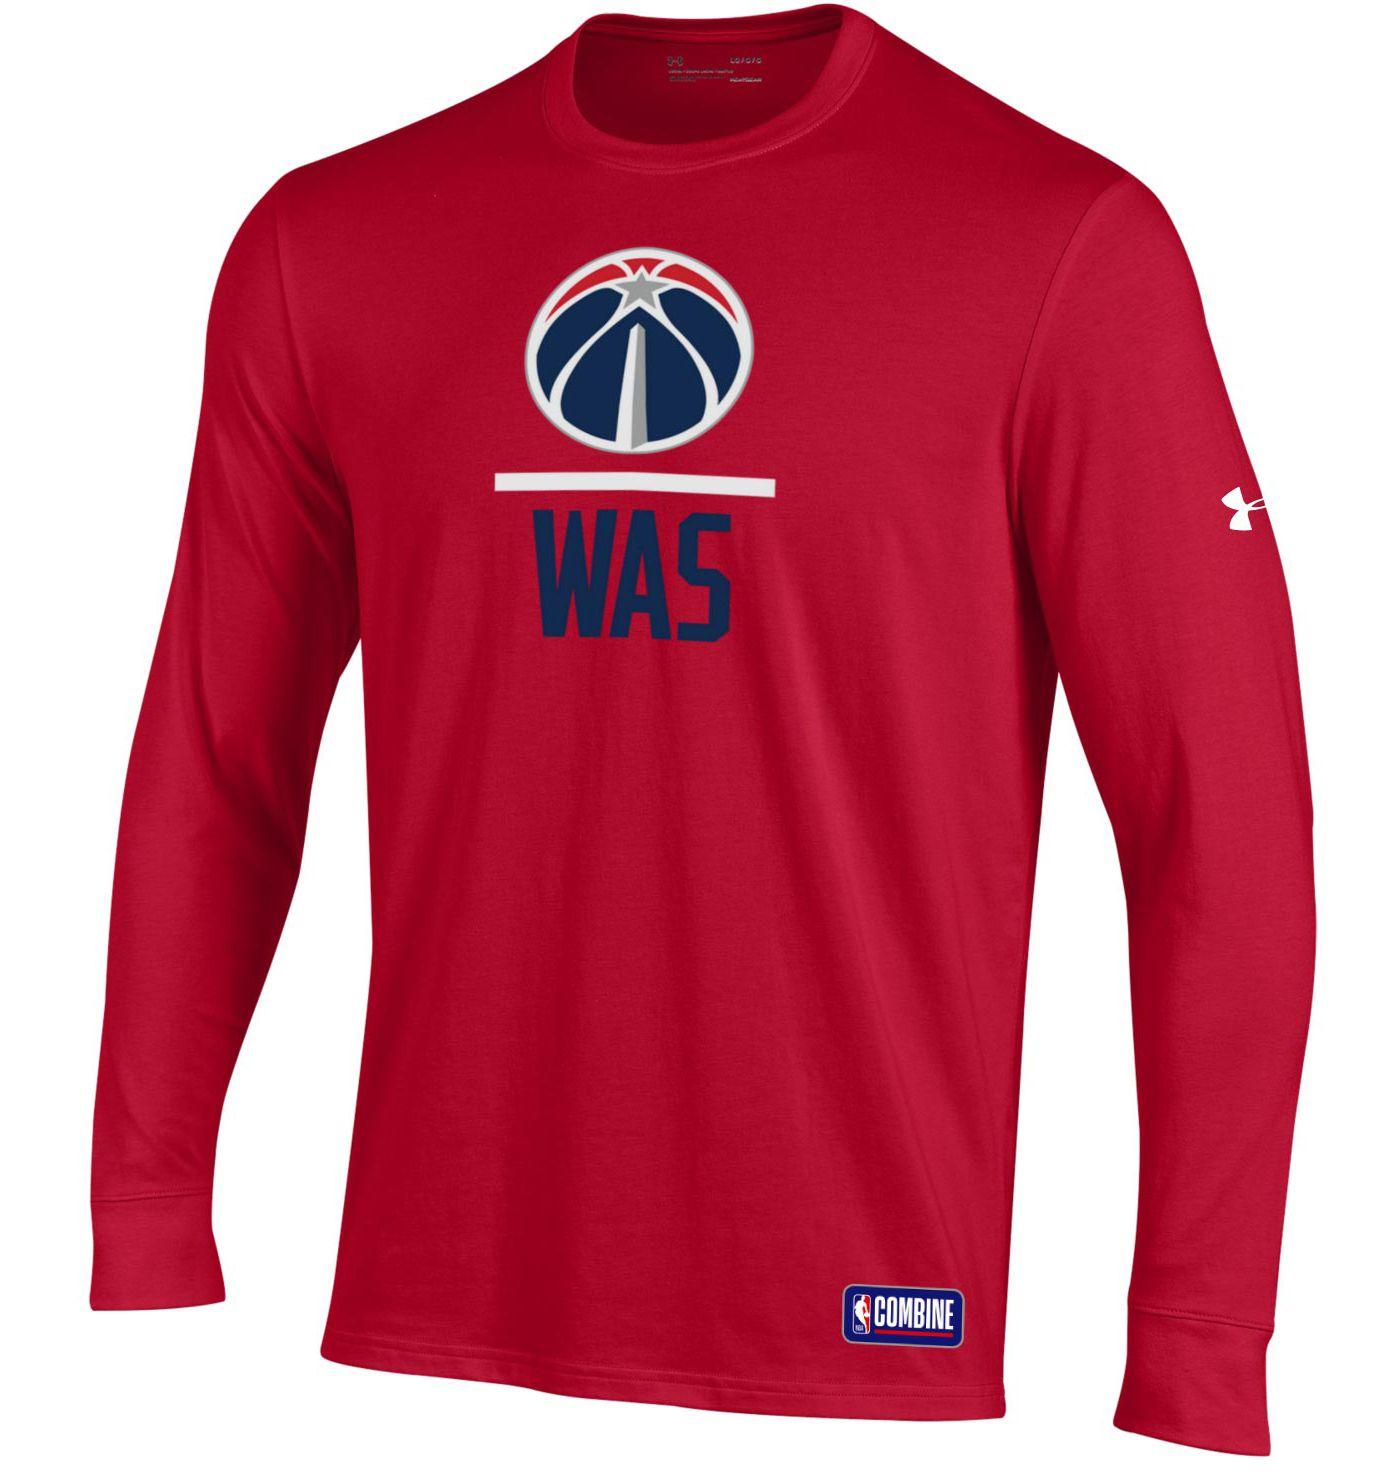 Under Armour Men's Washington Wizards Performance Long Sleeve Shirt